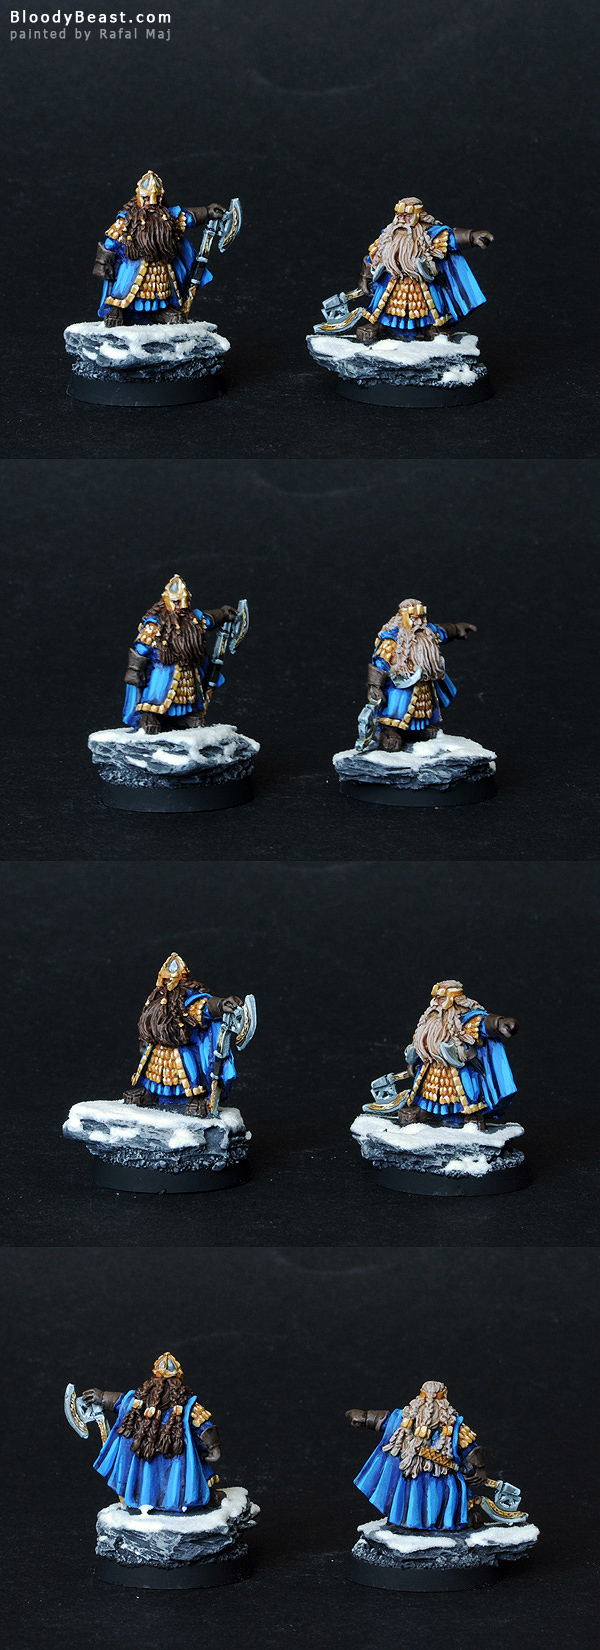 Dwarf Dain and Balin painted by Rafal Maj (BloodyBeast.com)